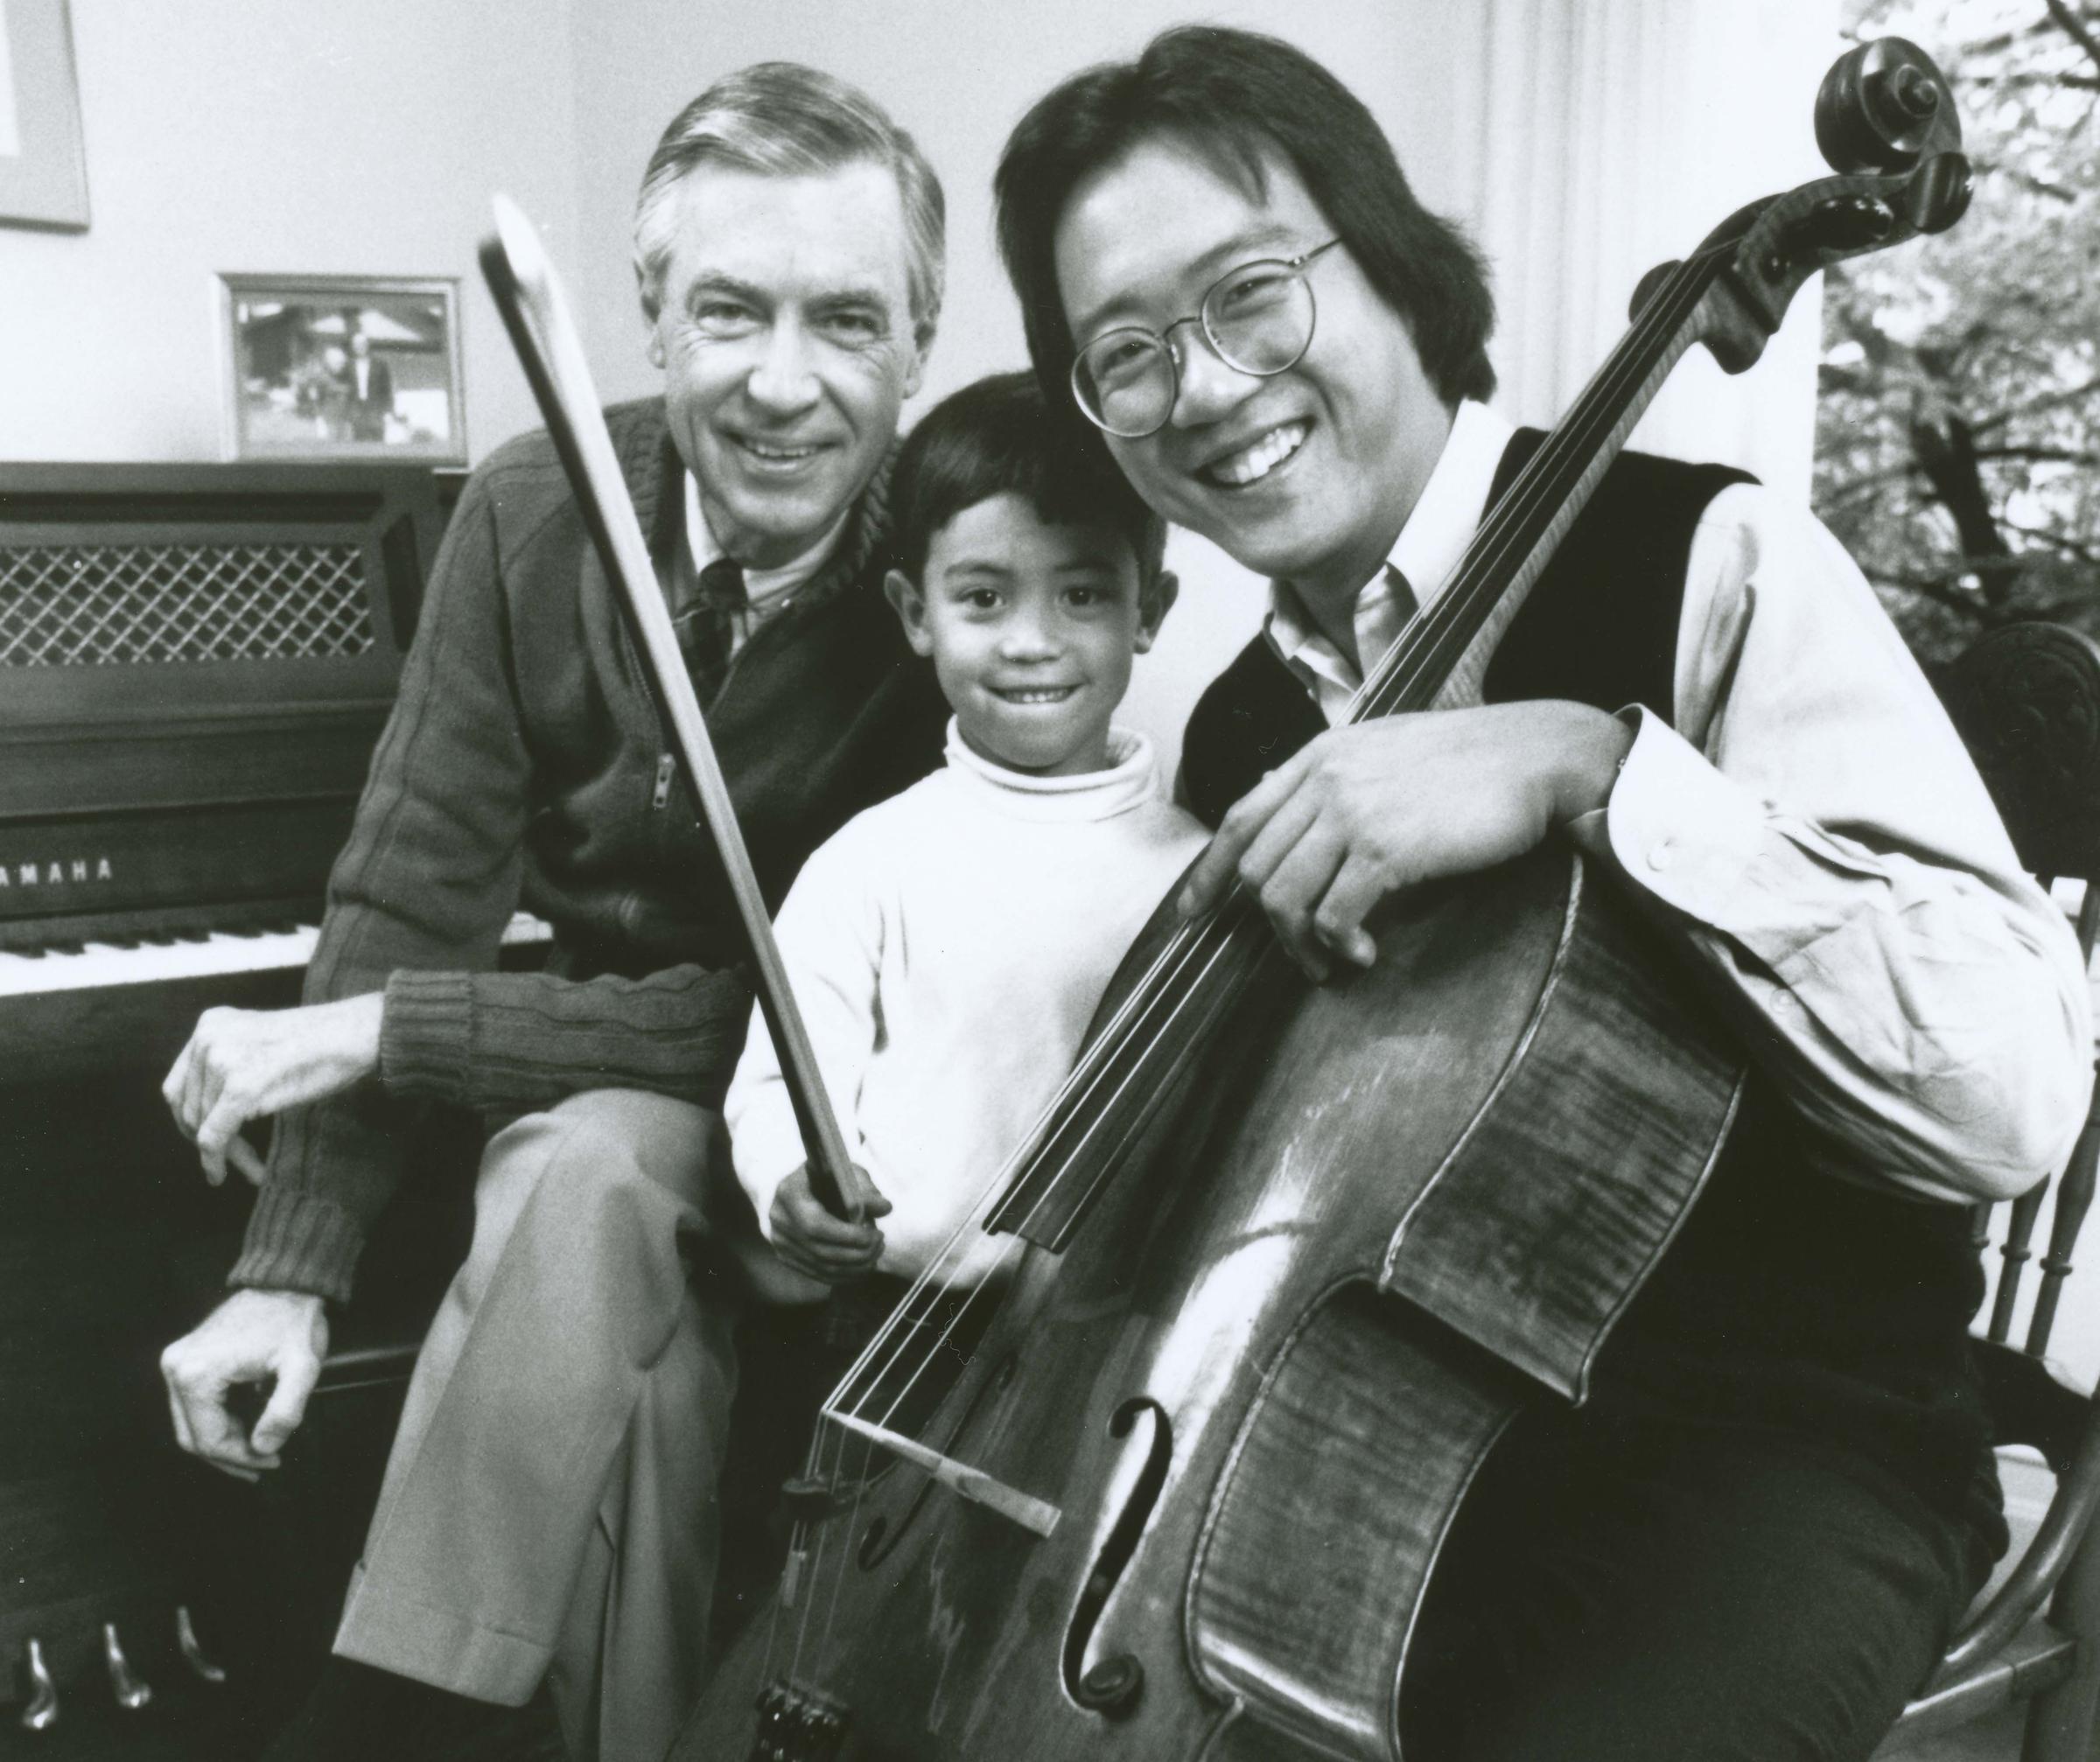 Mister Rogers Film Premieres On Tv Saturday Wvxu